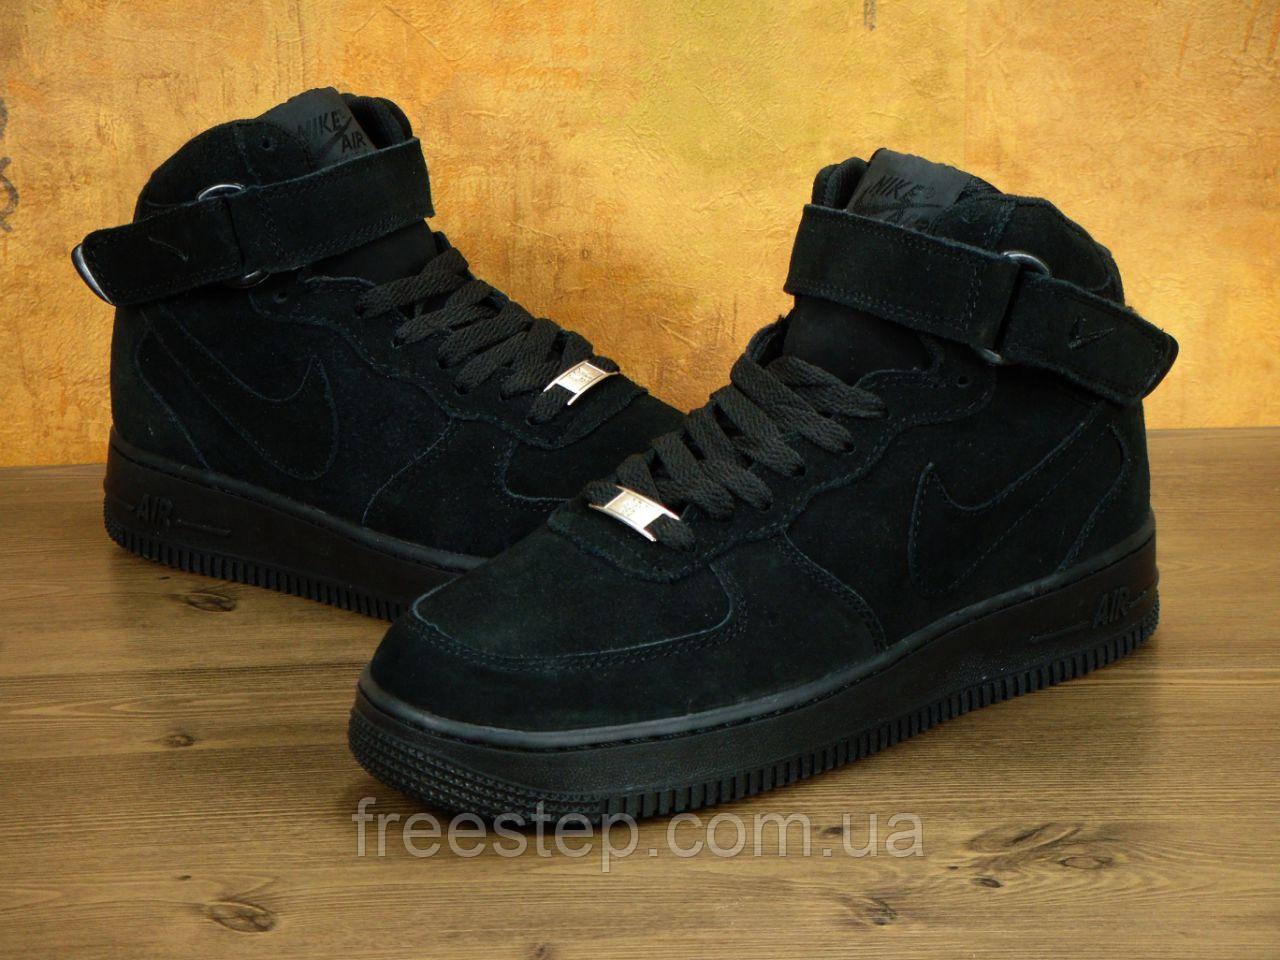 d24f6cab Зимние кроссовки в стиле NIKE Air Force 1 Mid, замша, мех, черные ...